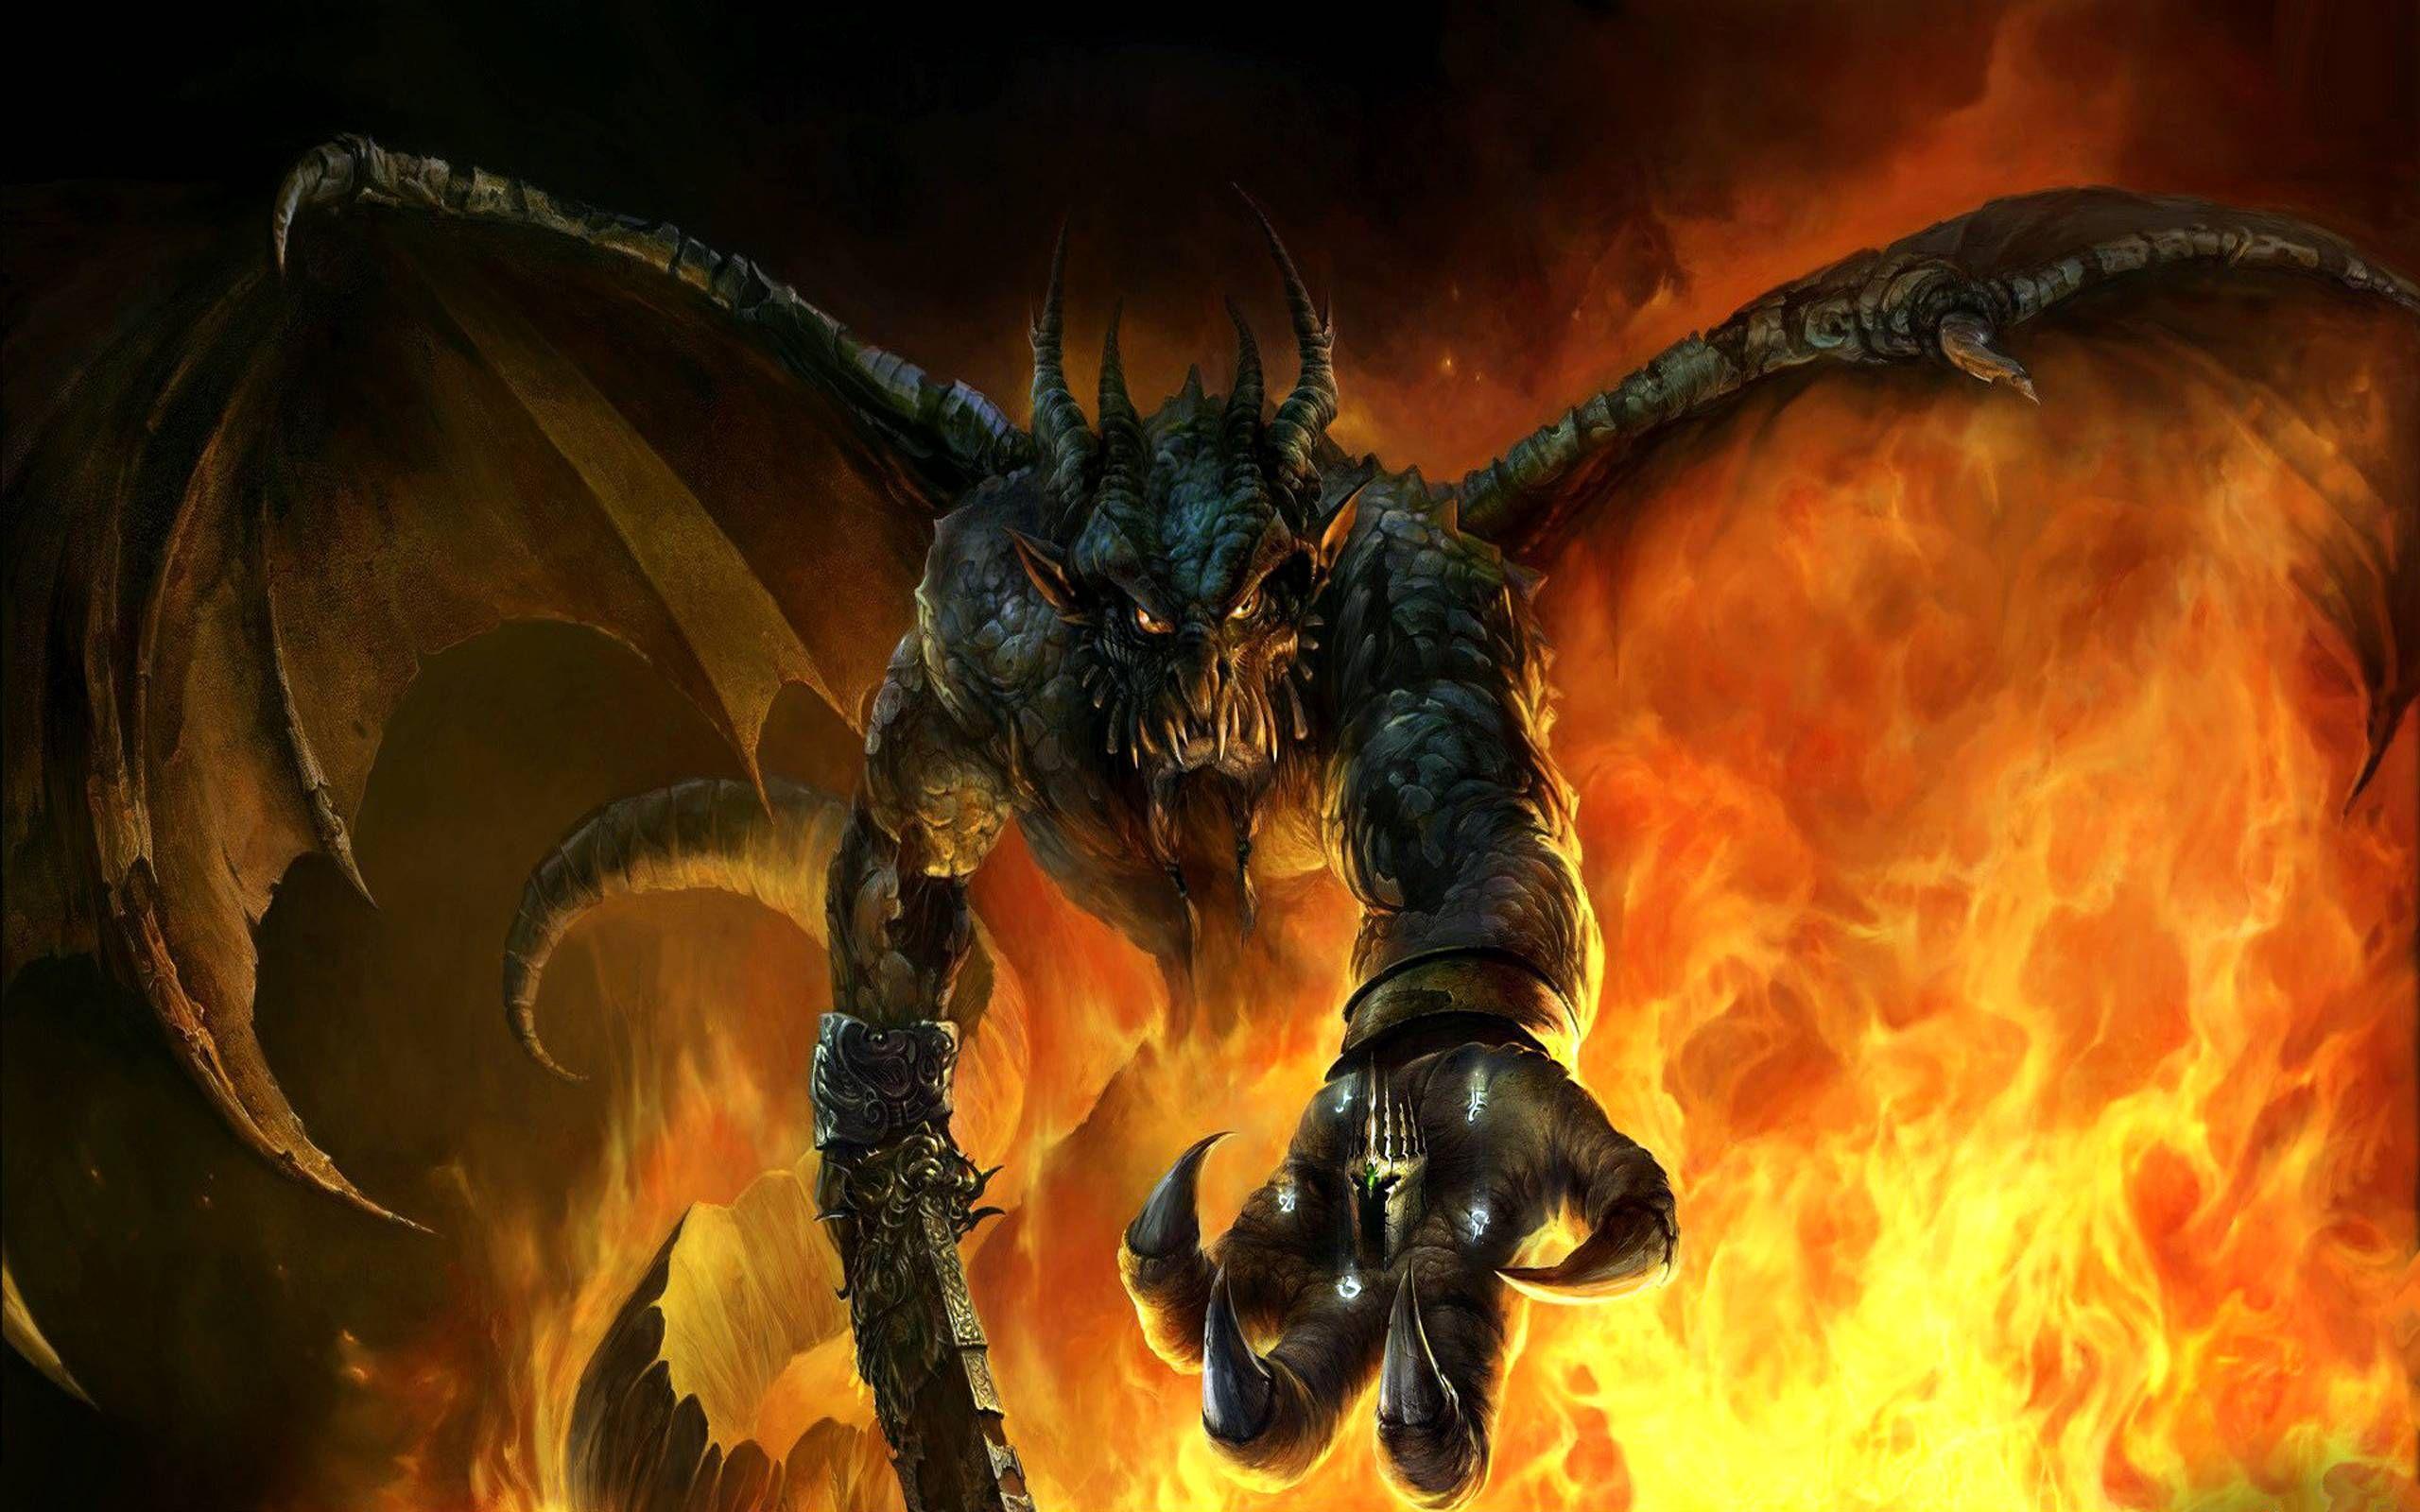 Demon Hd Photos 02006 Baltana Wallpaper Pictures Fantasy Demon Image King